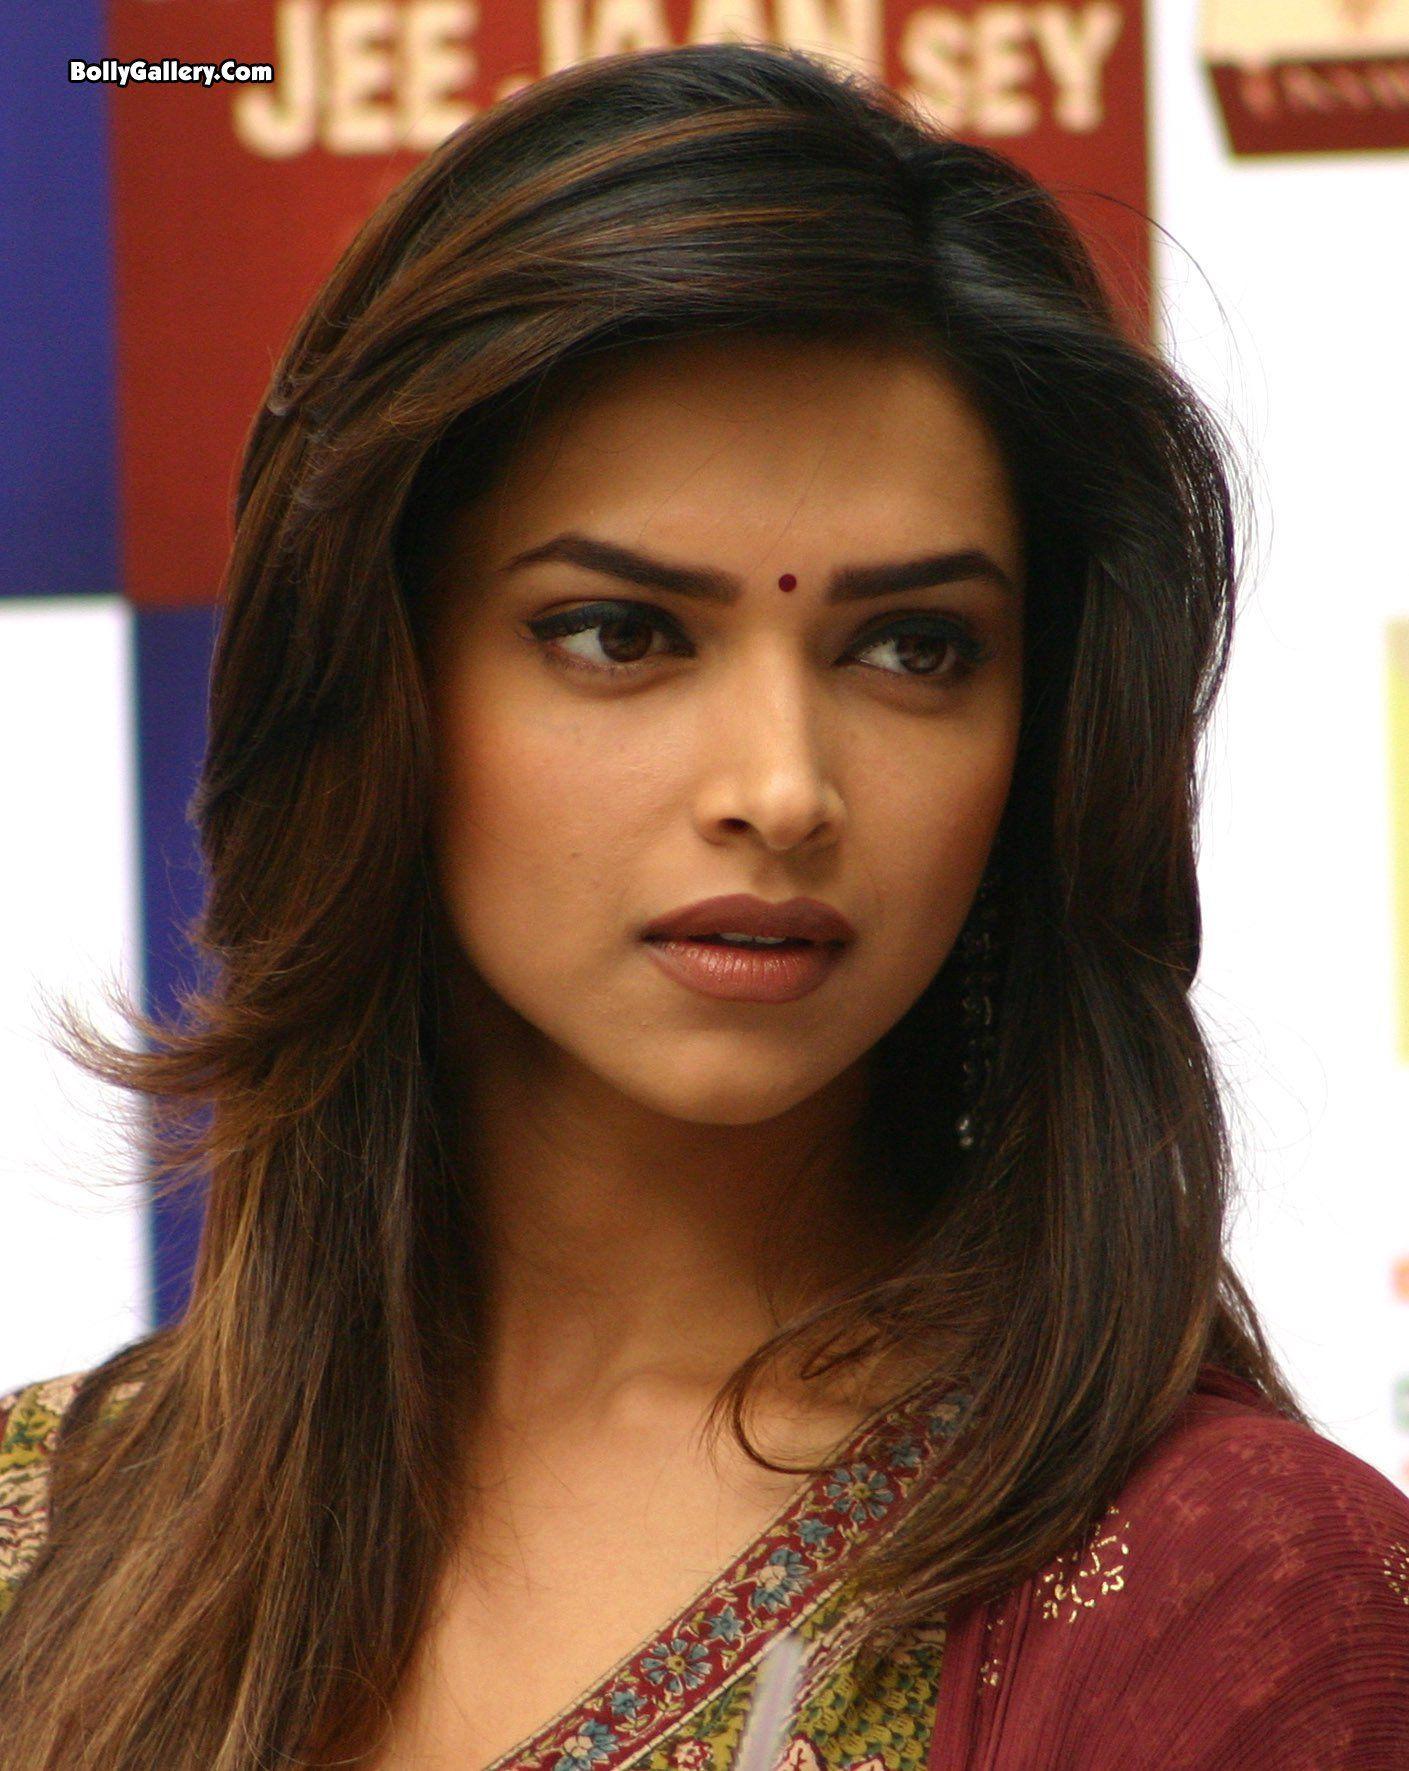 Bollywood Actress Model Deepika Padukone Bollywood